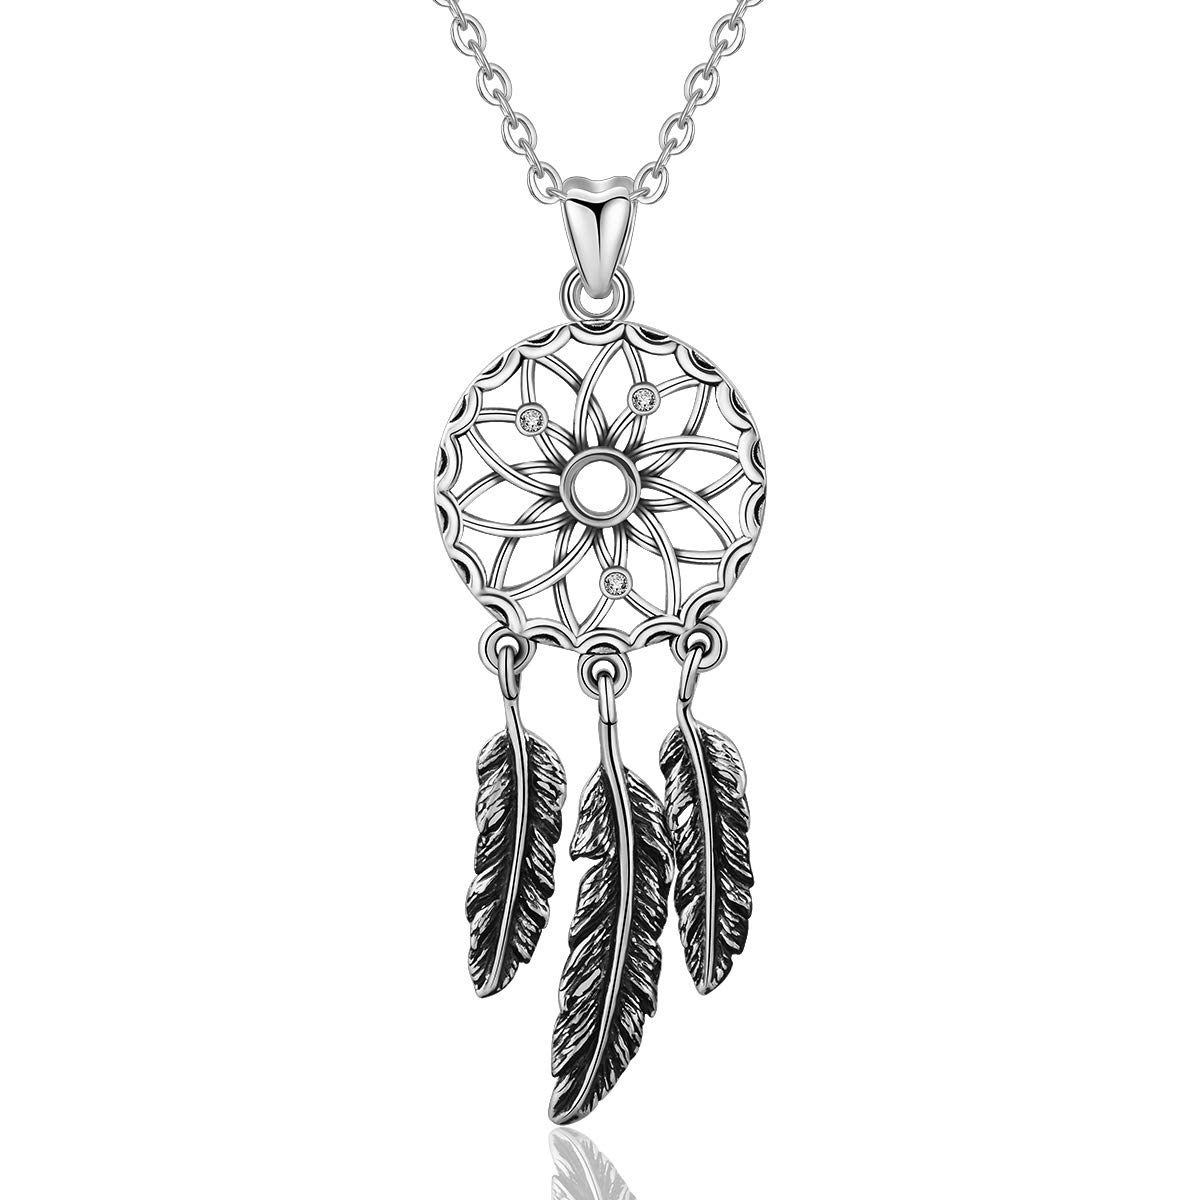 EUDORA Vintage Sterling Silver Dreamcatcher Necklace Good Luck Dangling Feather Pendant, 18'' Chain